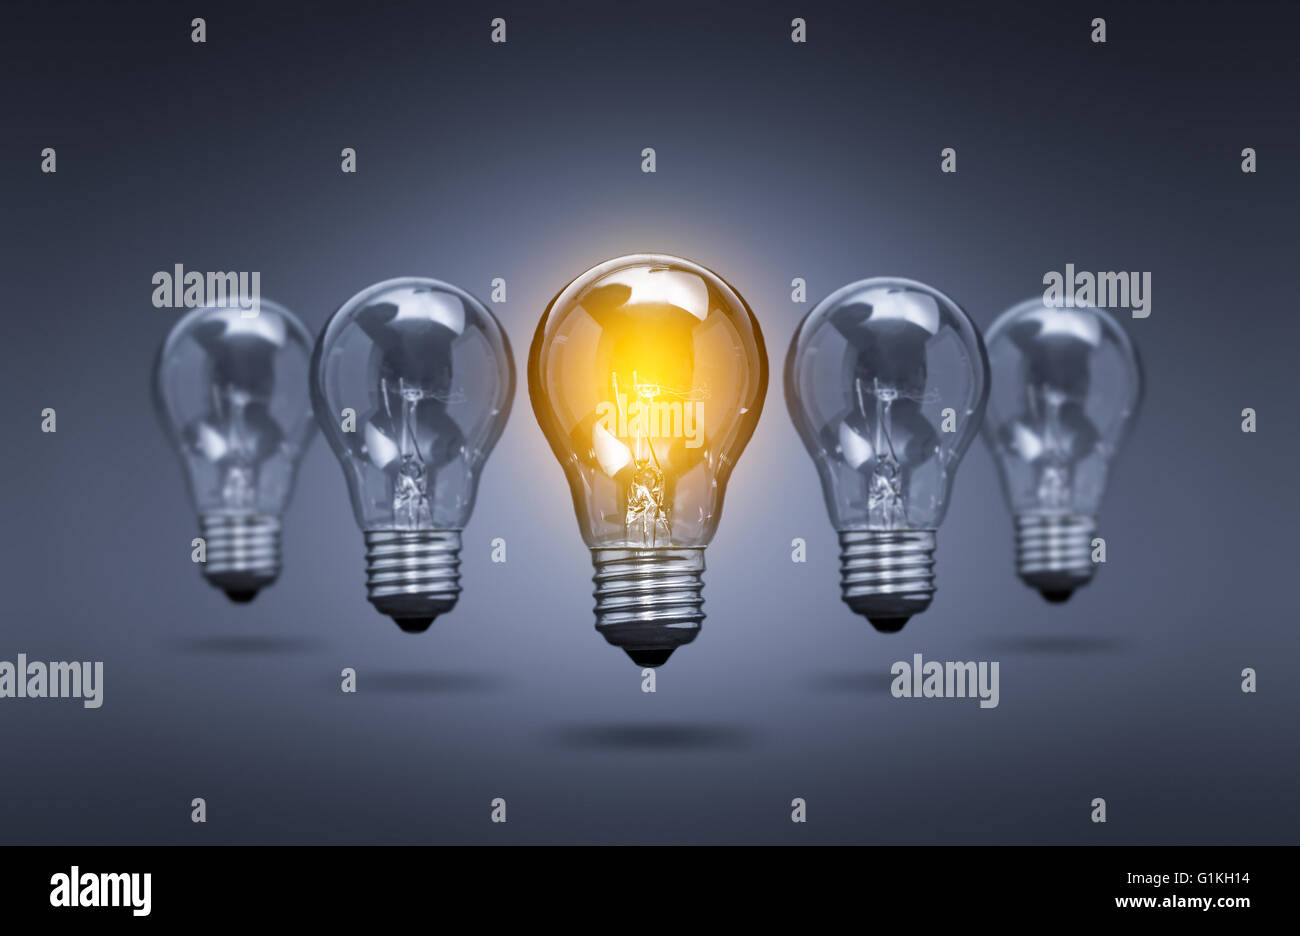 Bombilla de luz Idea Creativa Innovación líder - Stock Image Imagen De Stock